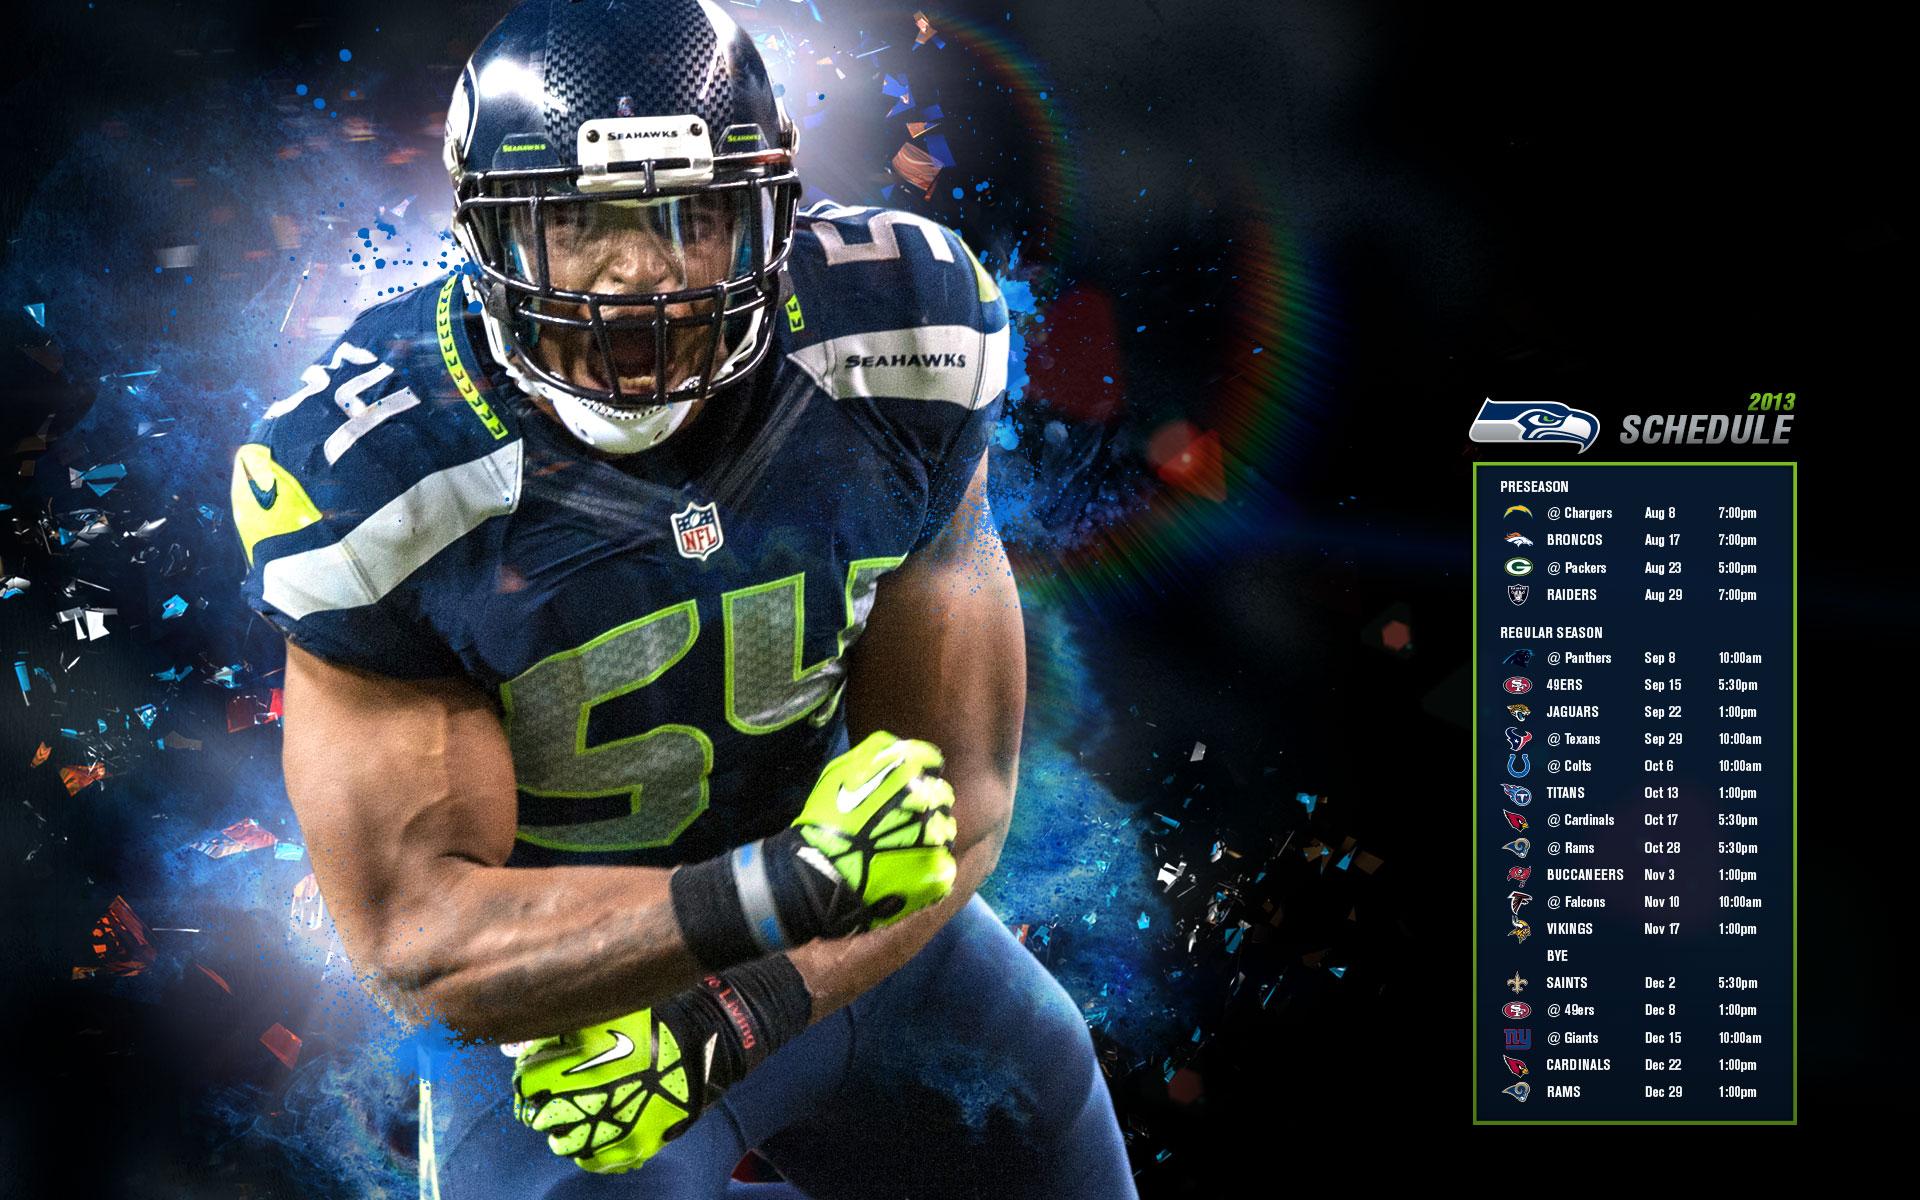 Seattle Seahawks Hd Wallpapers Backgrounds